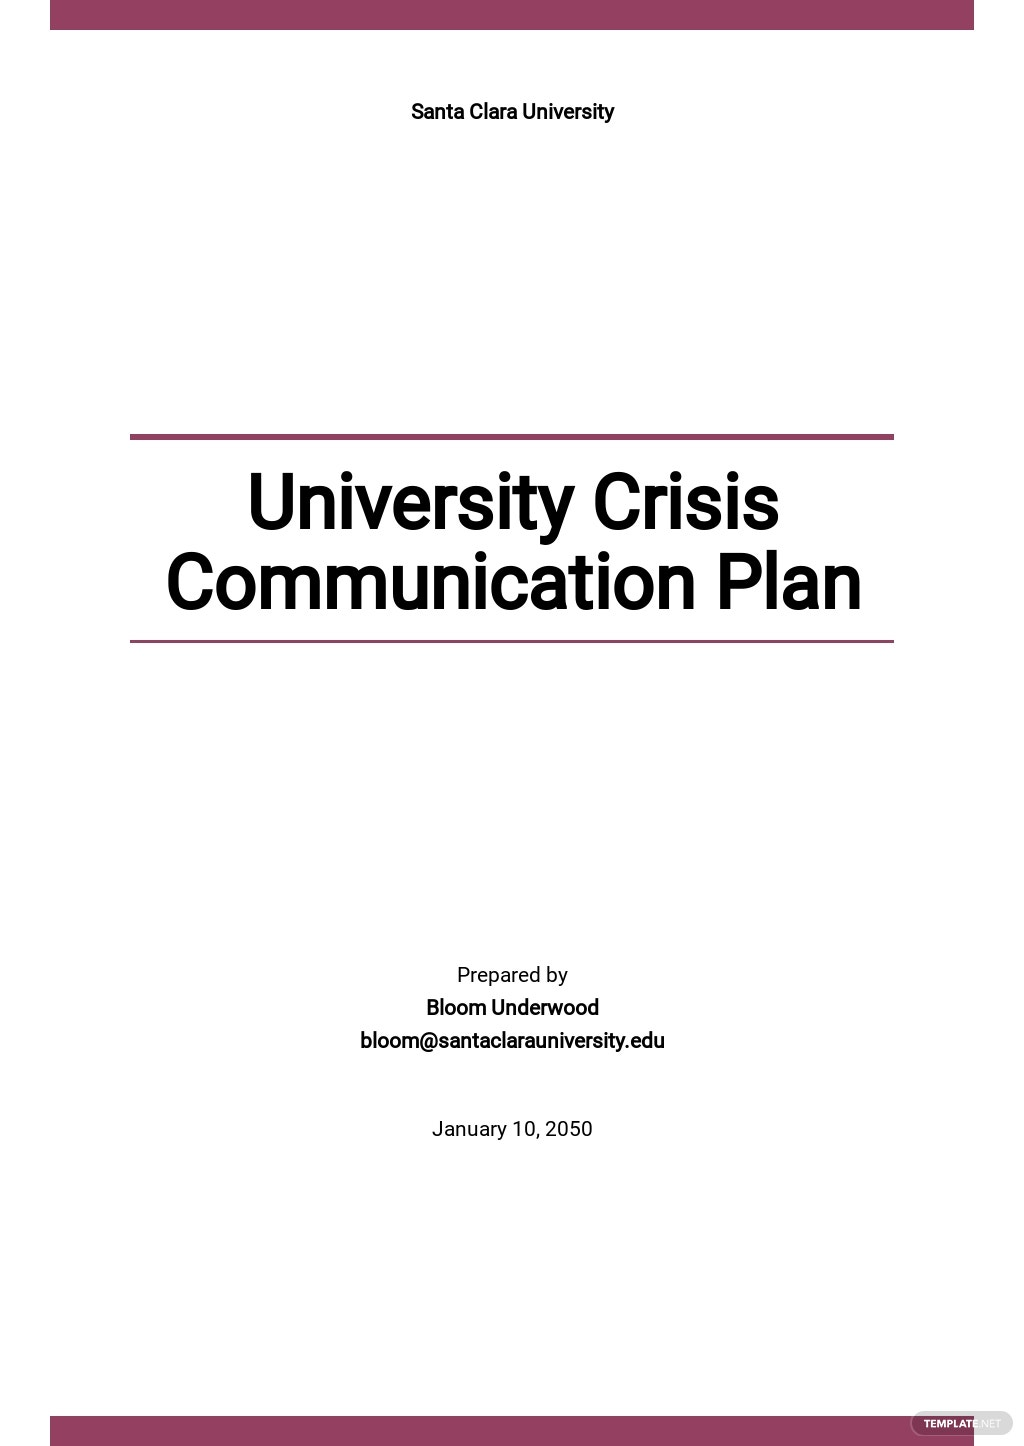 University Crisis Communication Plan Template.jpe